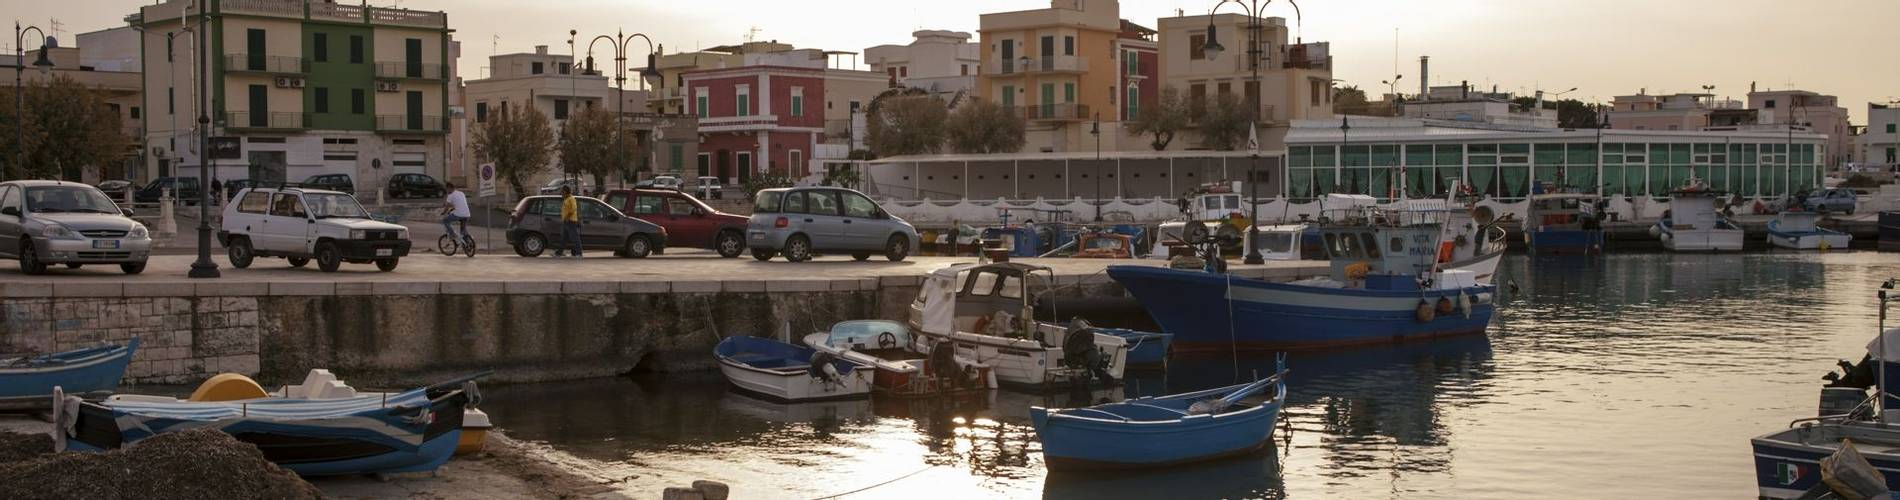 Porto-di-Savelletri.jpg